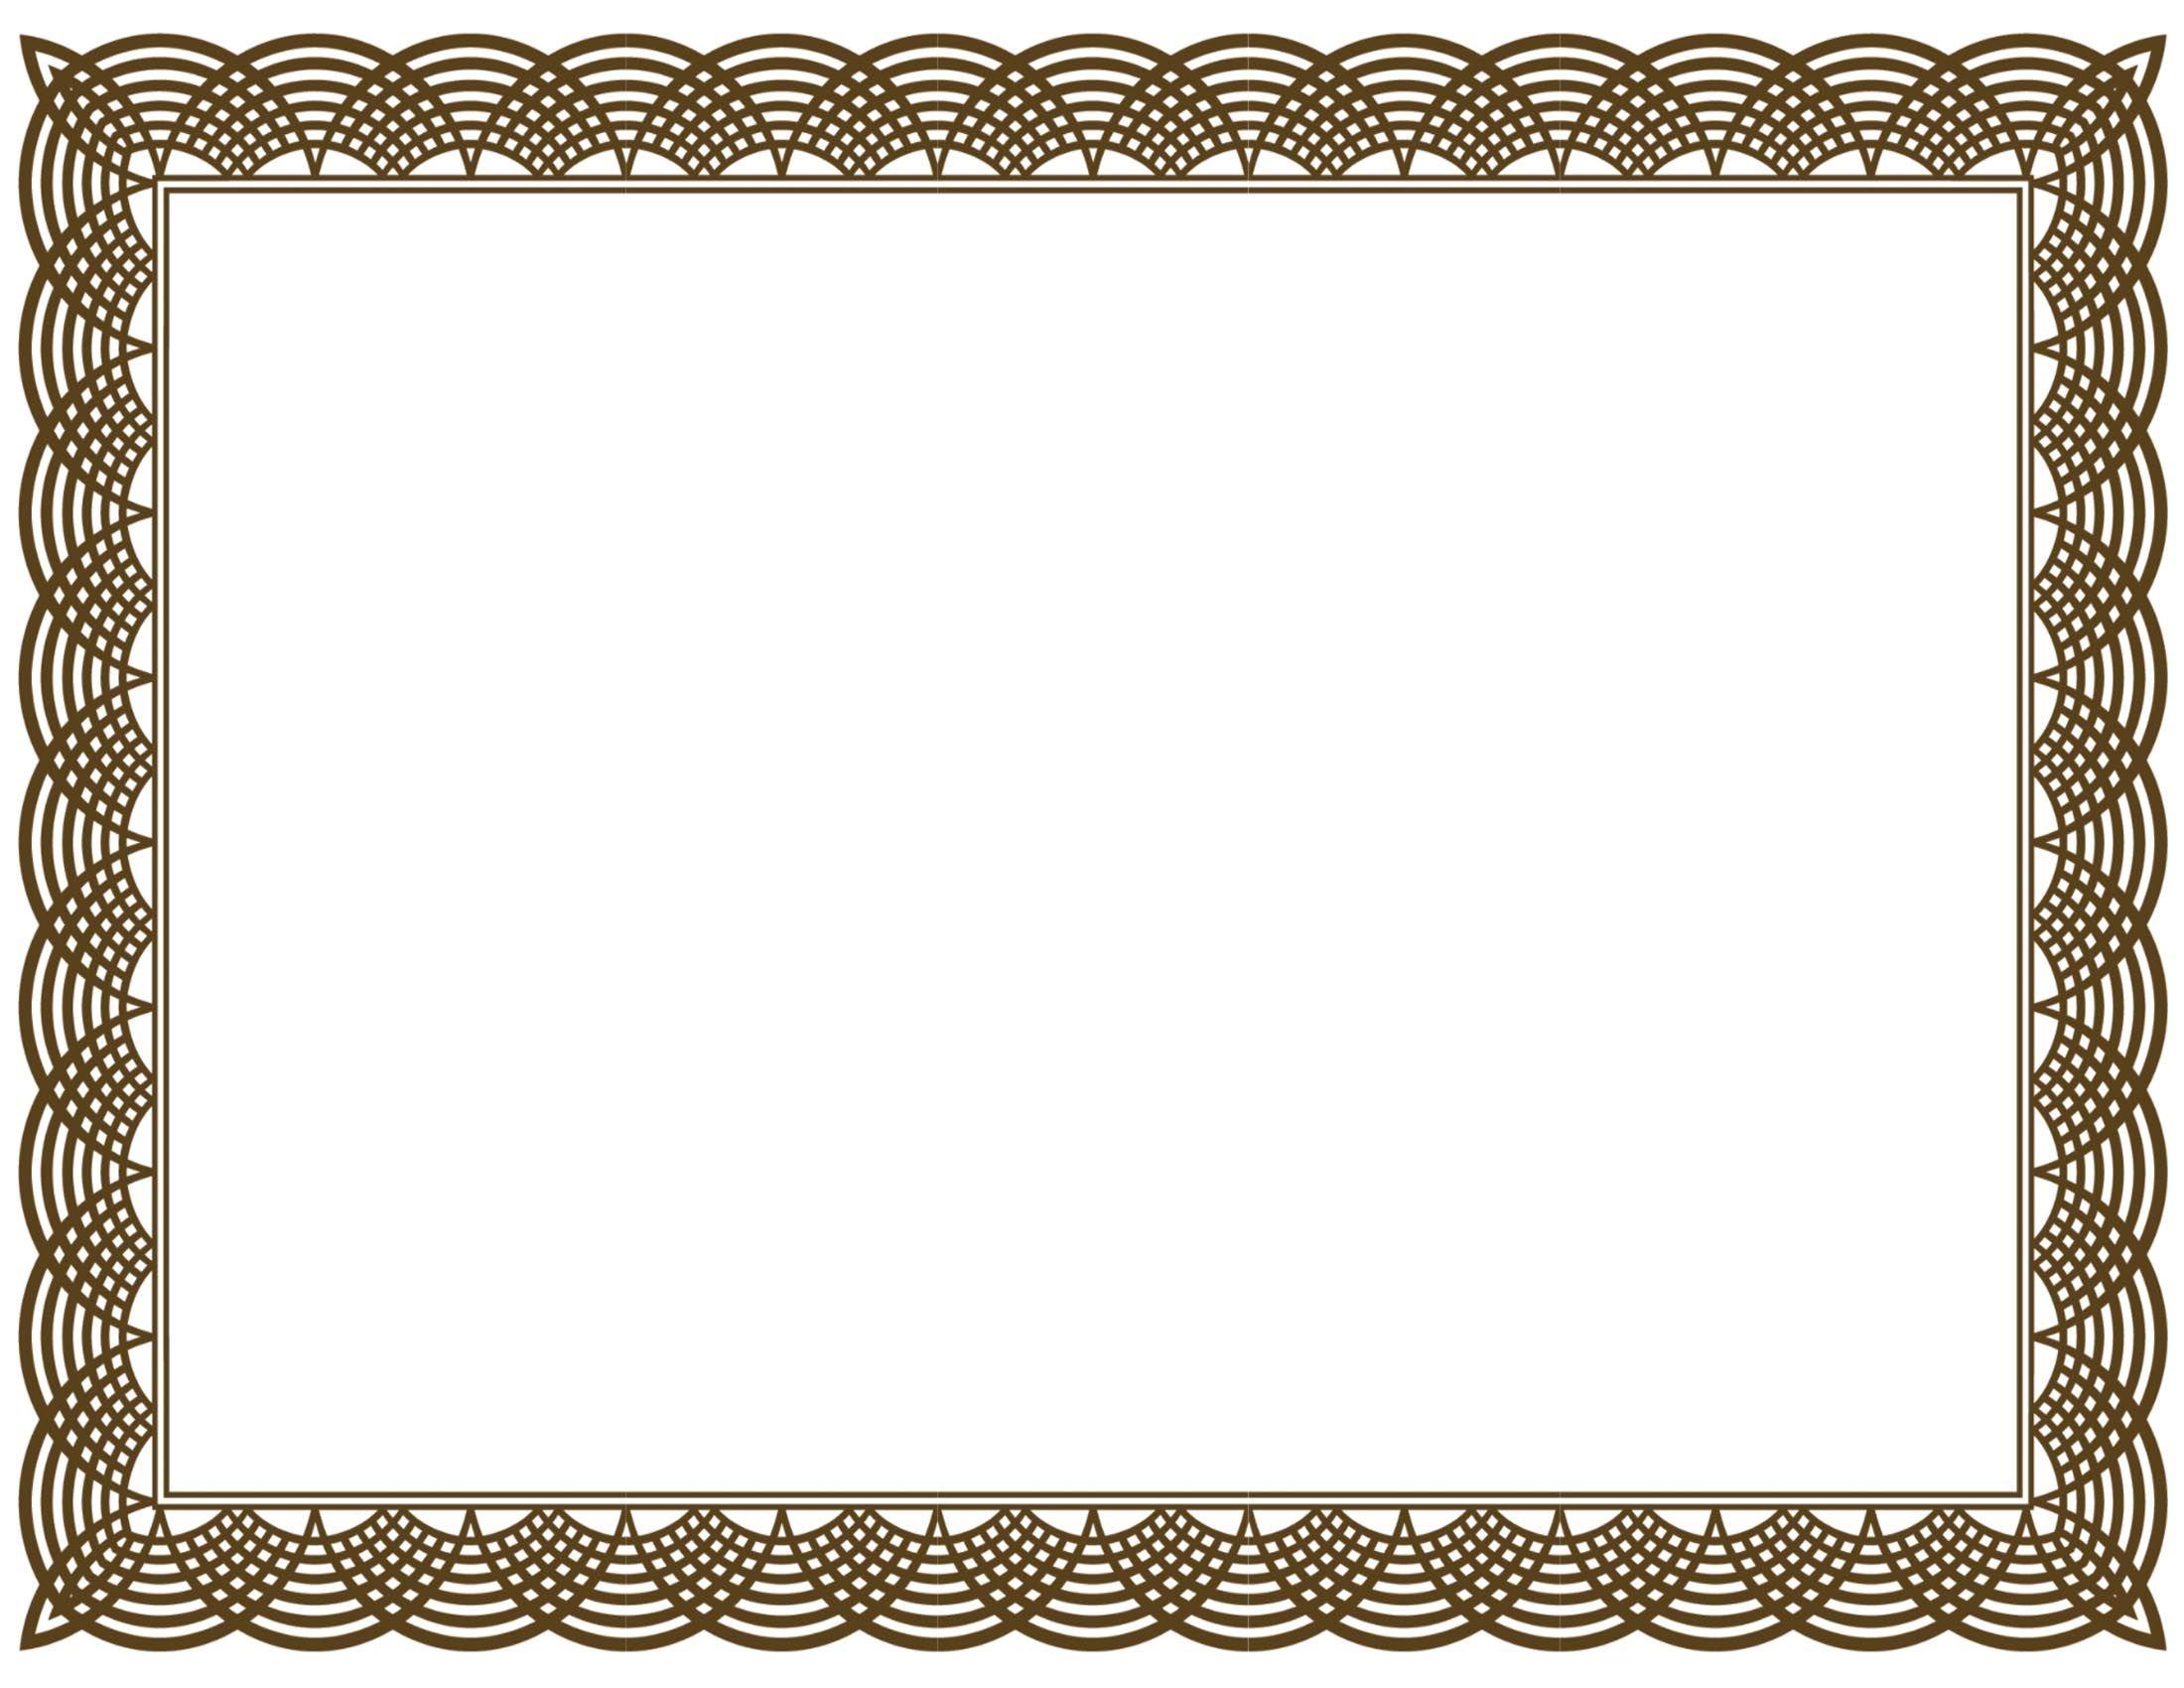 Free Certificate Border Templates For Word Besttemplates123 Seni Bingkai Pola